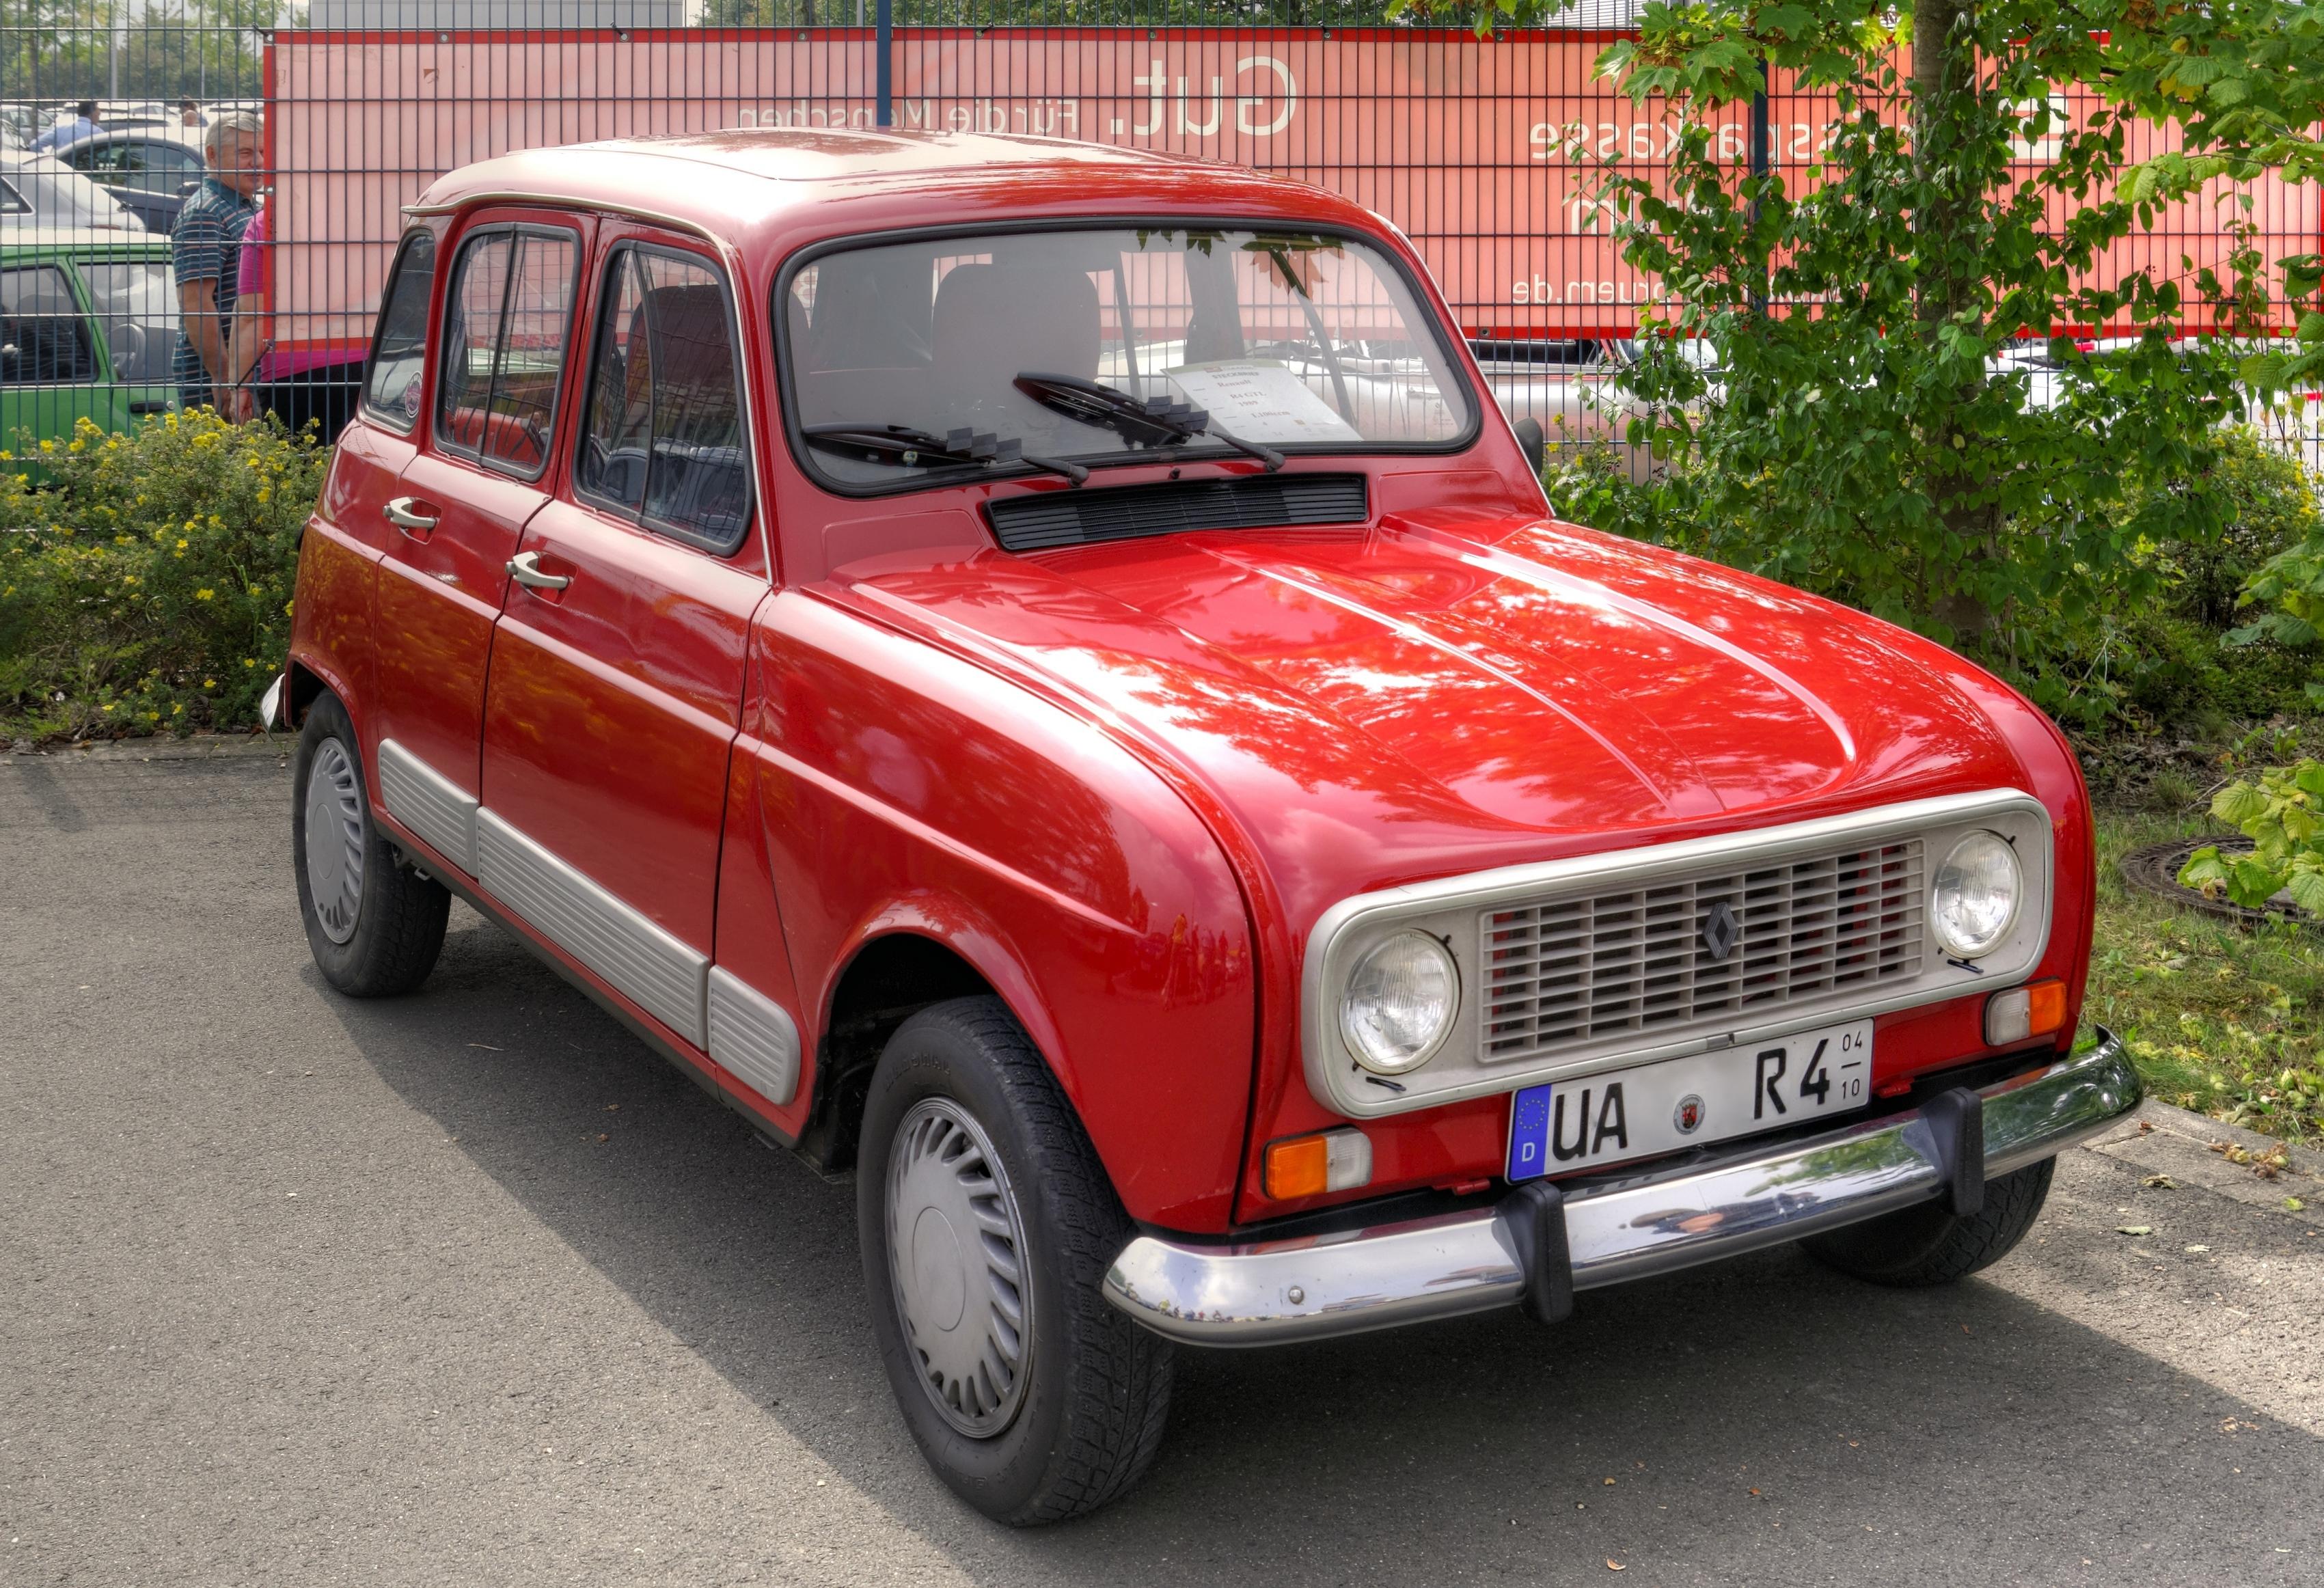 �r4_File:RenaultR42014-09-0713-09-59.jpg-WikimediaCommons